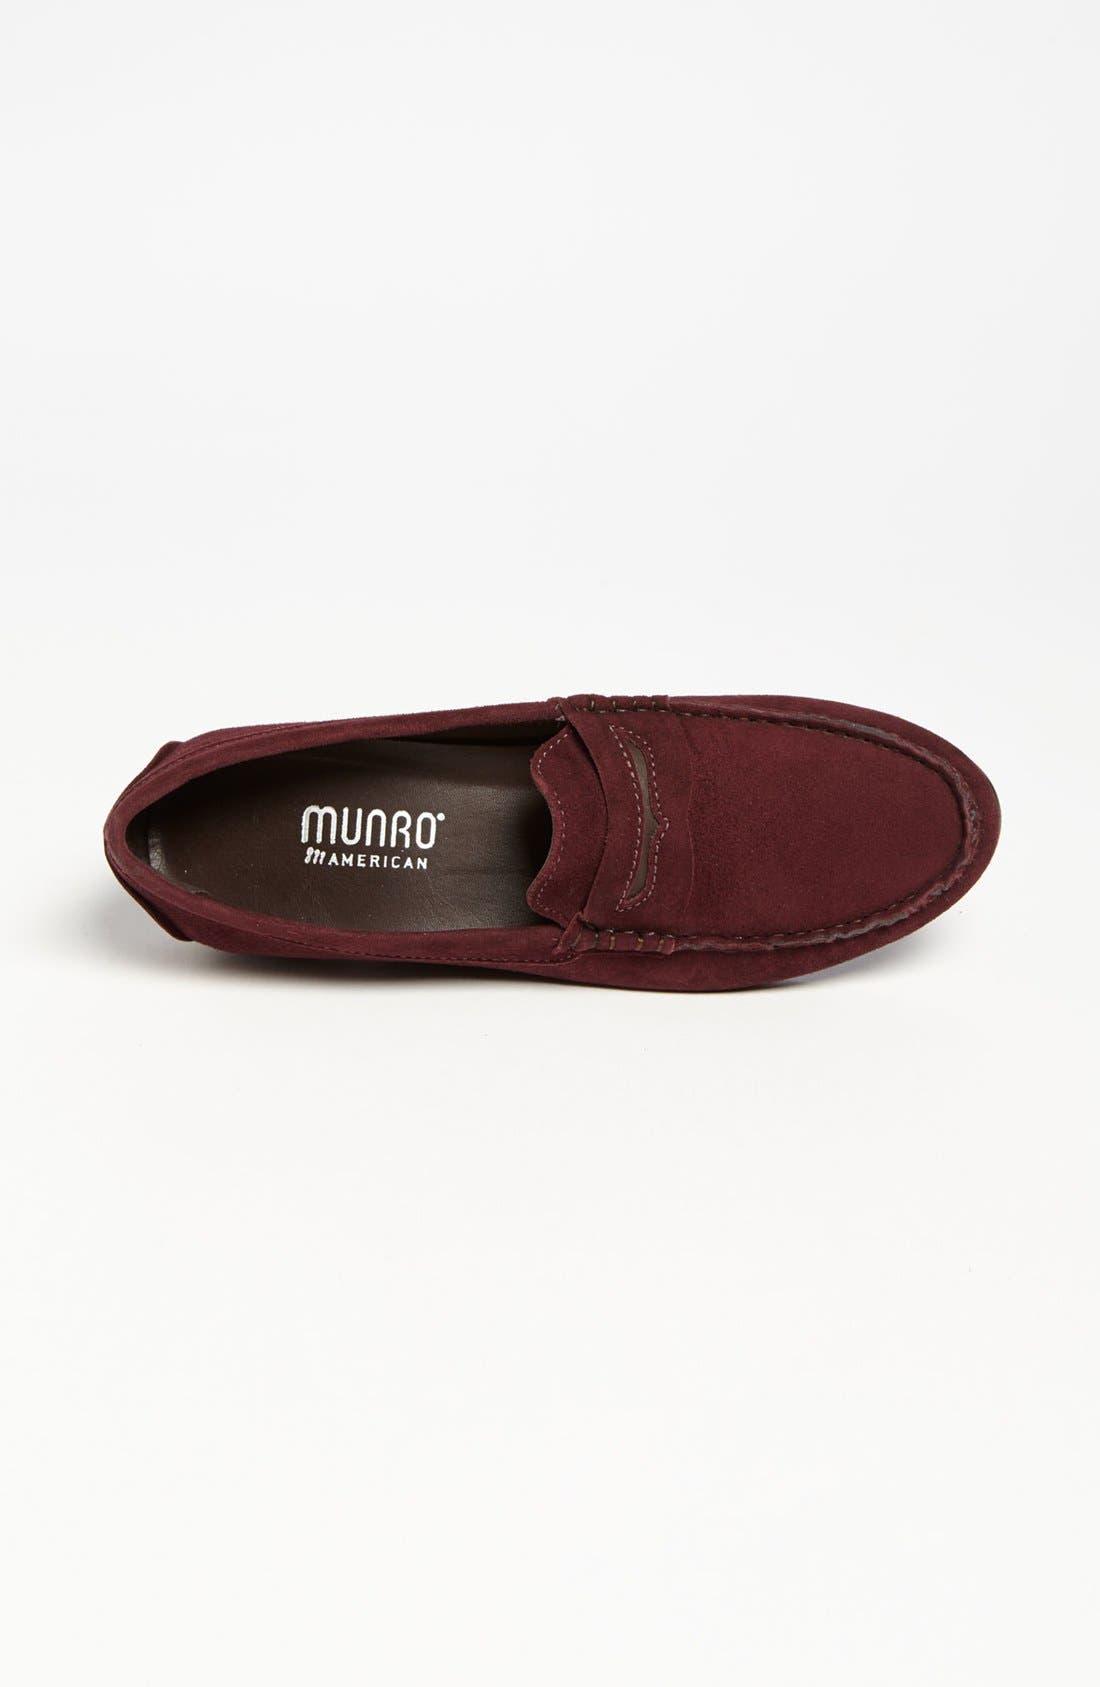 Alternate Image 3  - Munro 'Ramie' Loafer